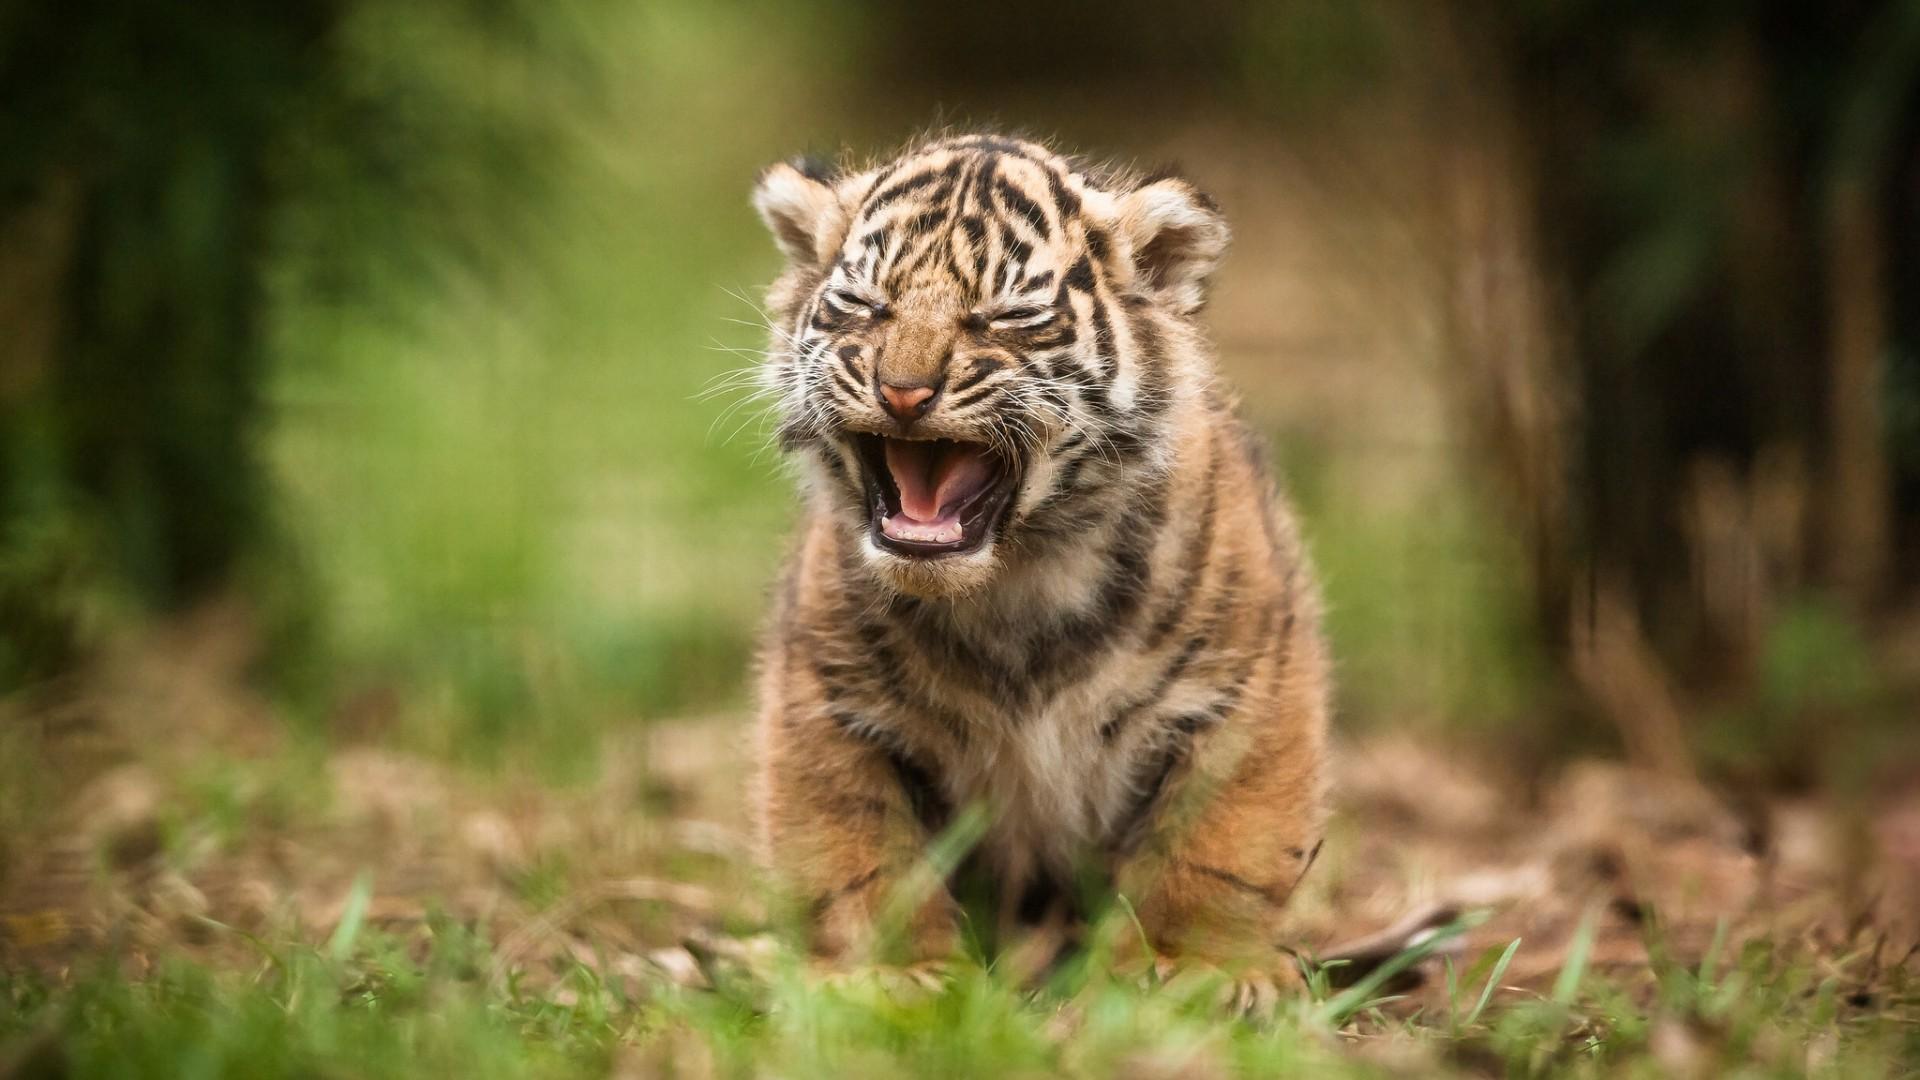 Saber Tooth Tiger Wallpaper (71+ images)